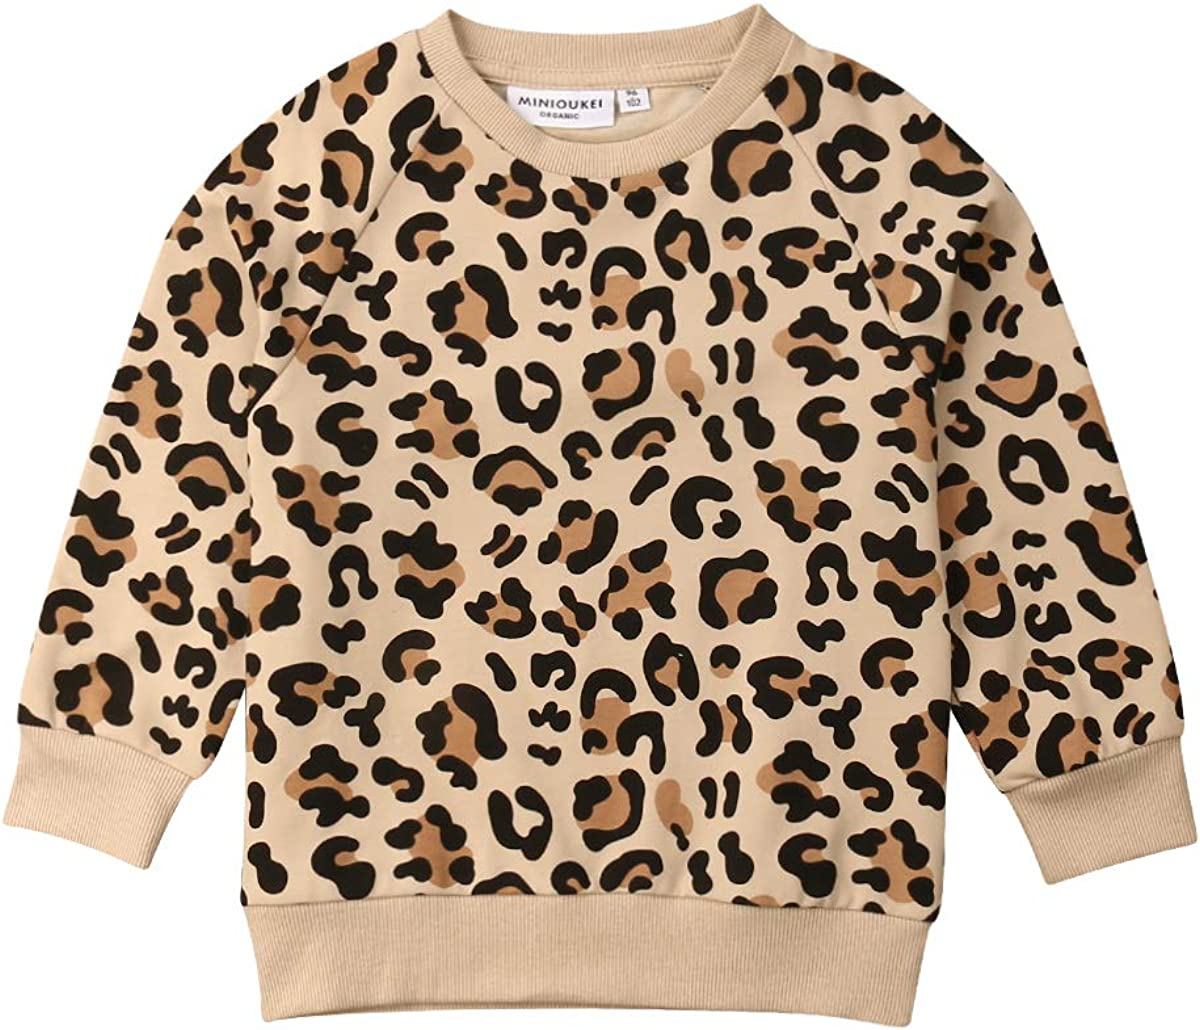 Unisex Baby Sun and Rainbow Sweatshirt Autumn Cotton Long Sleeve Shirt Top